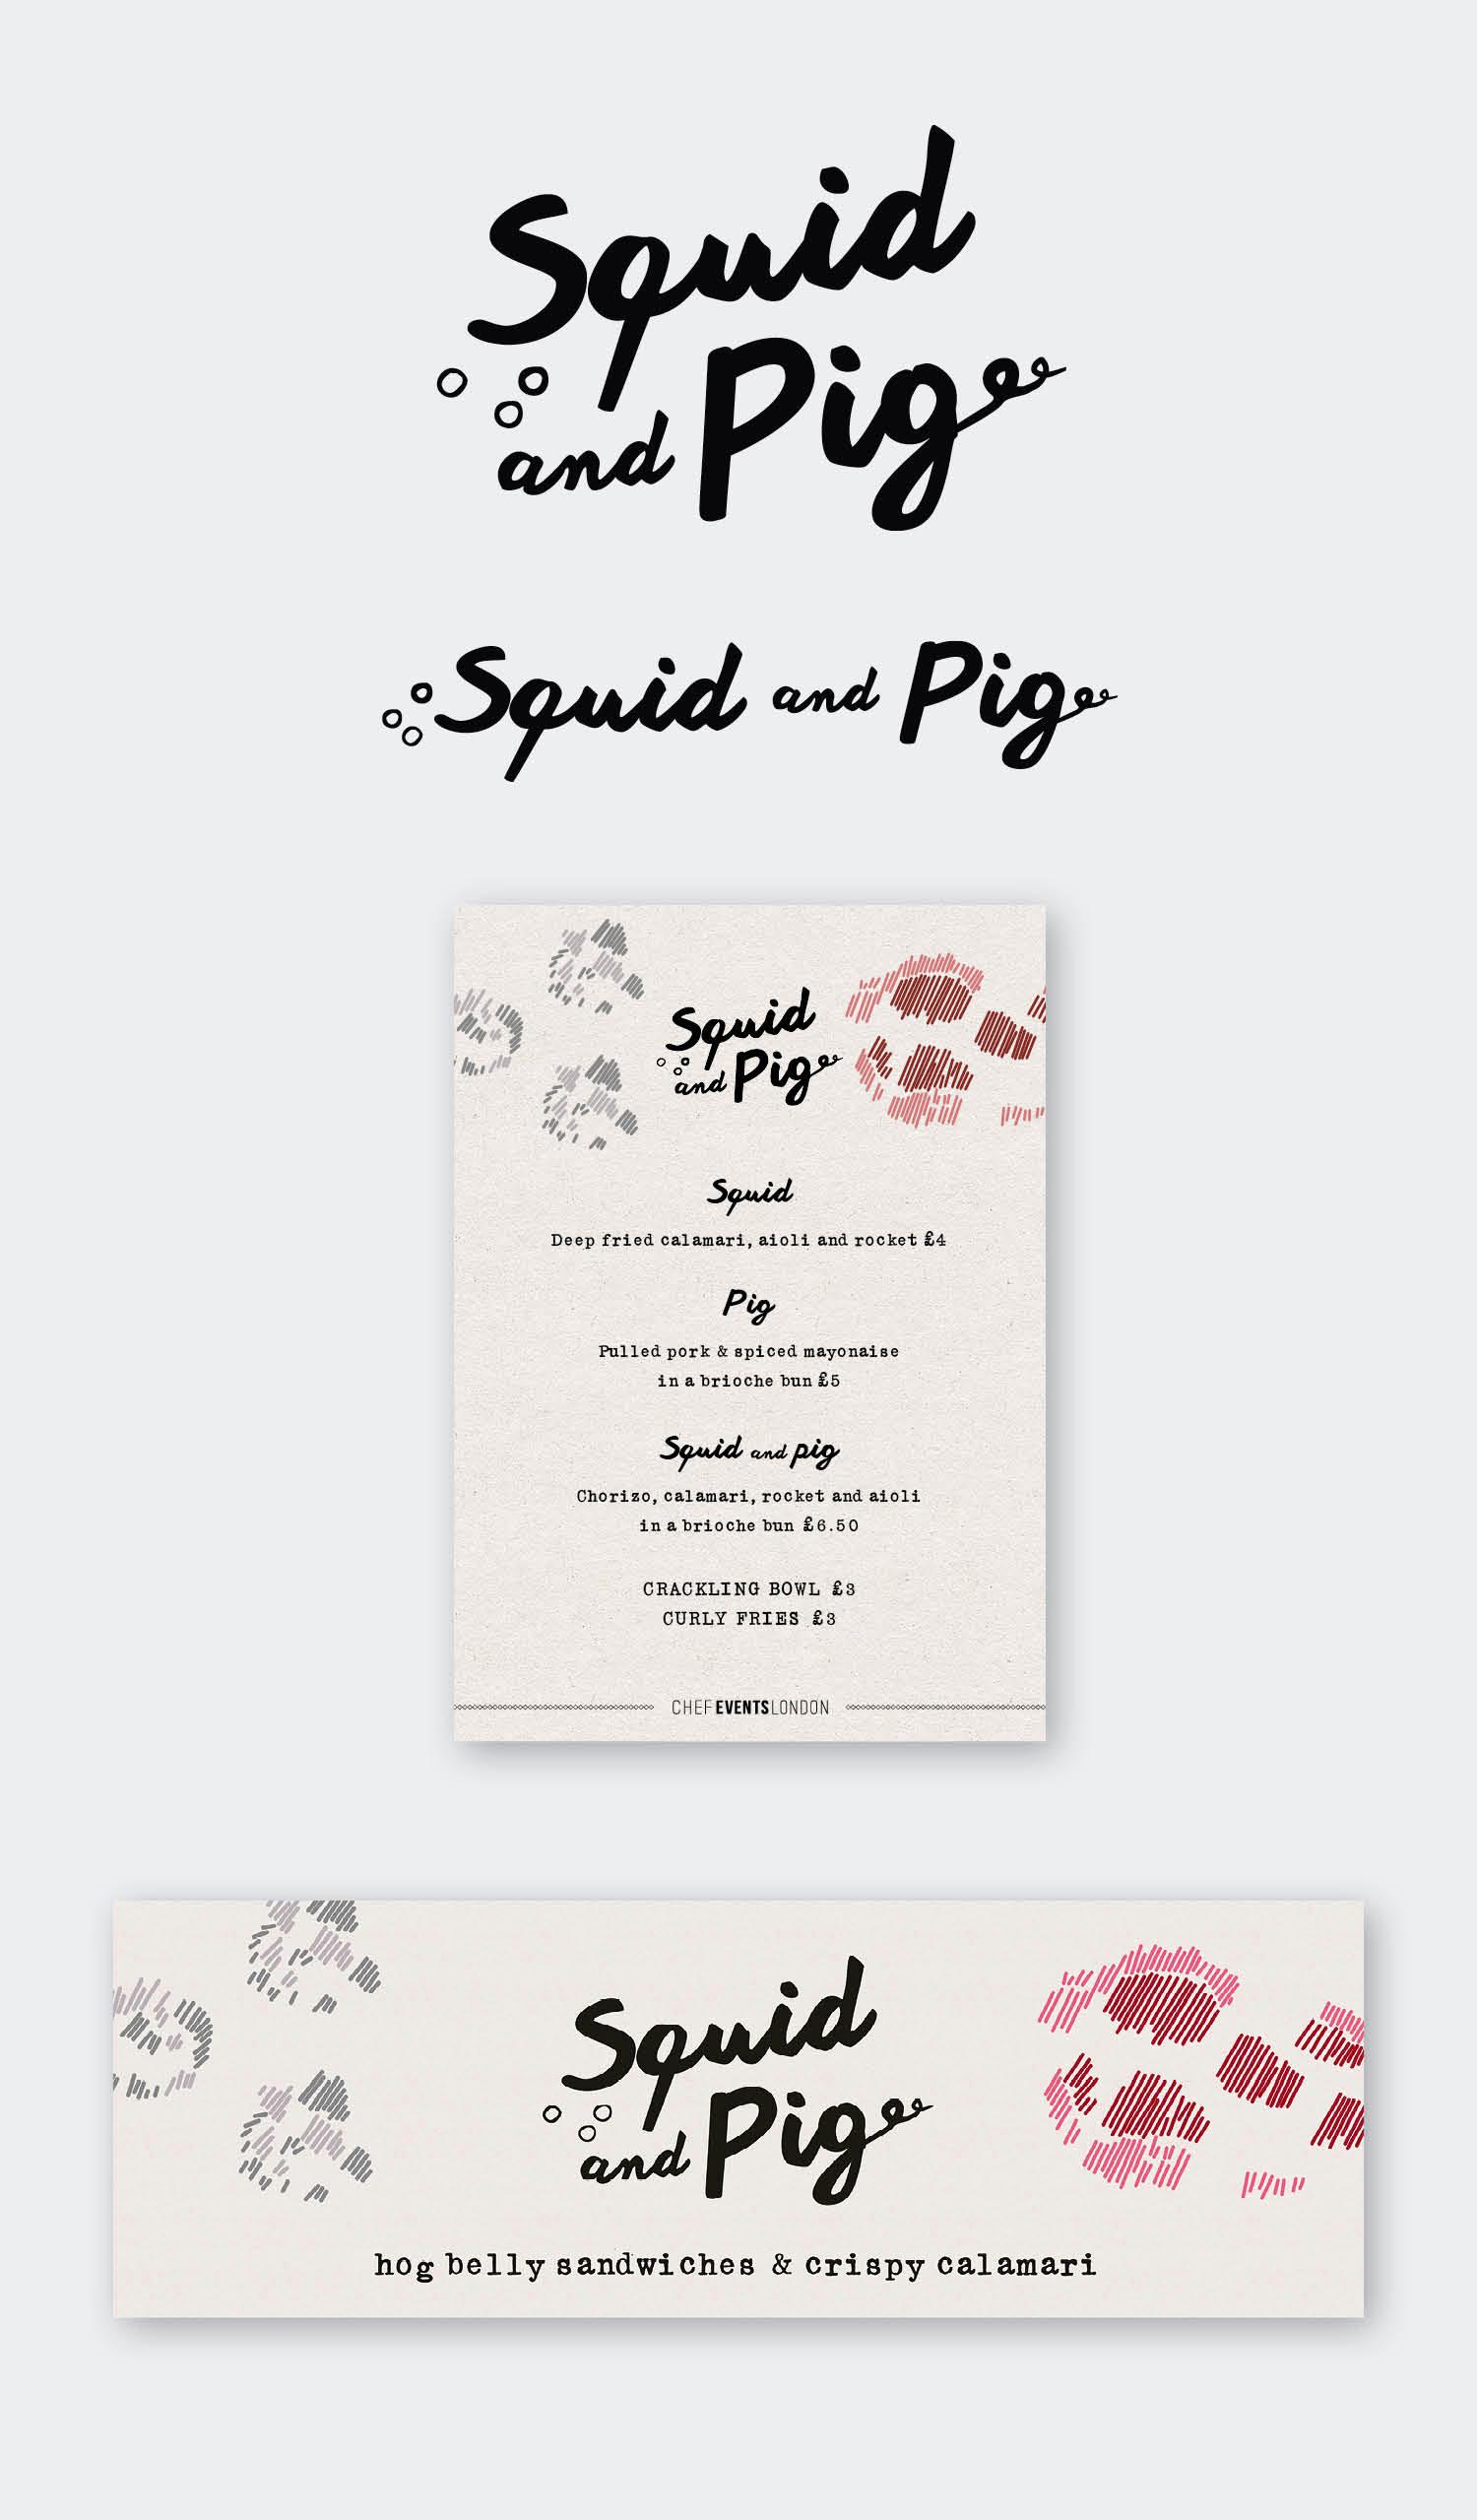 Squid3.jpg